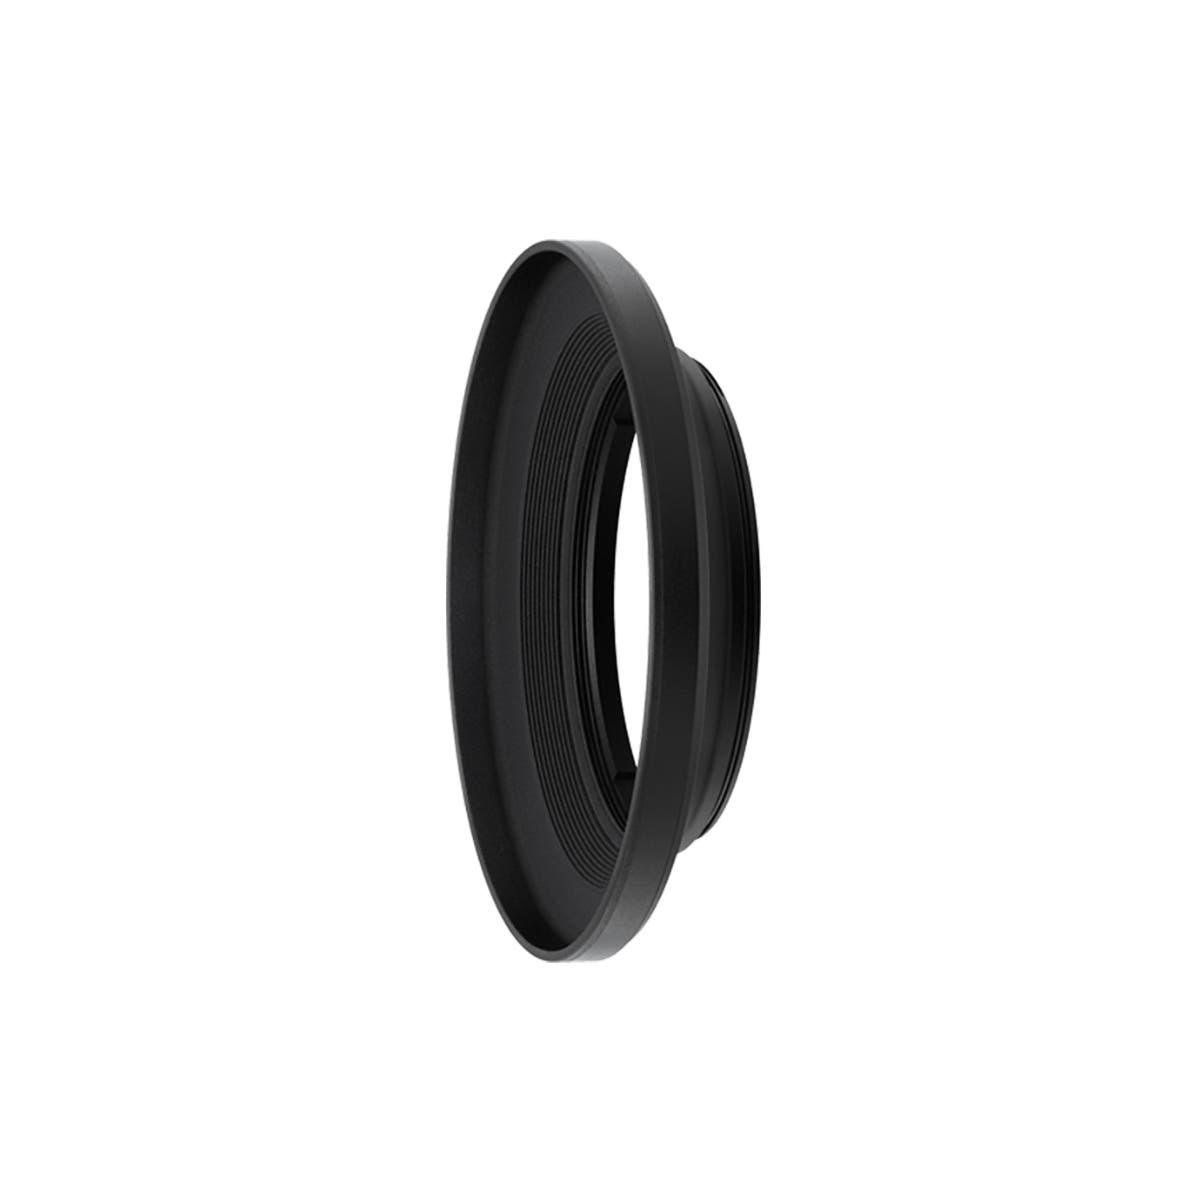 HN-CP20 Lens Hood